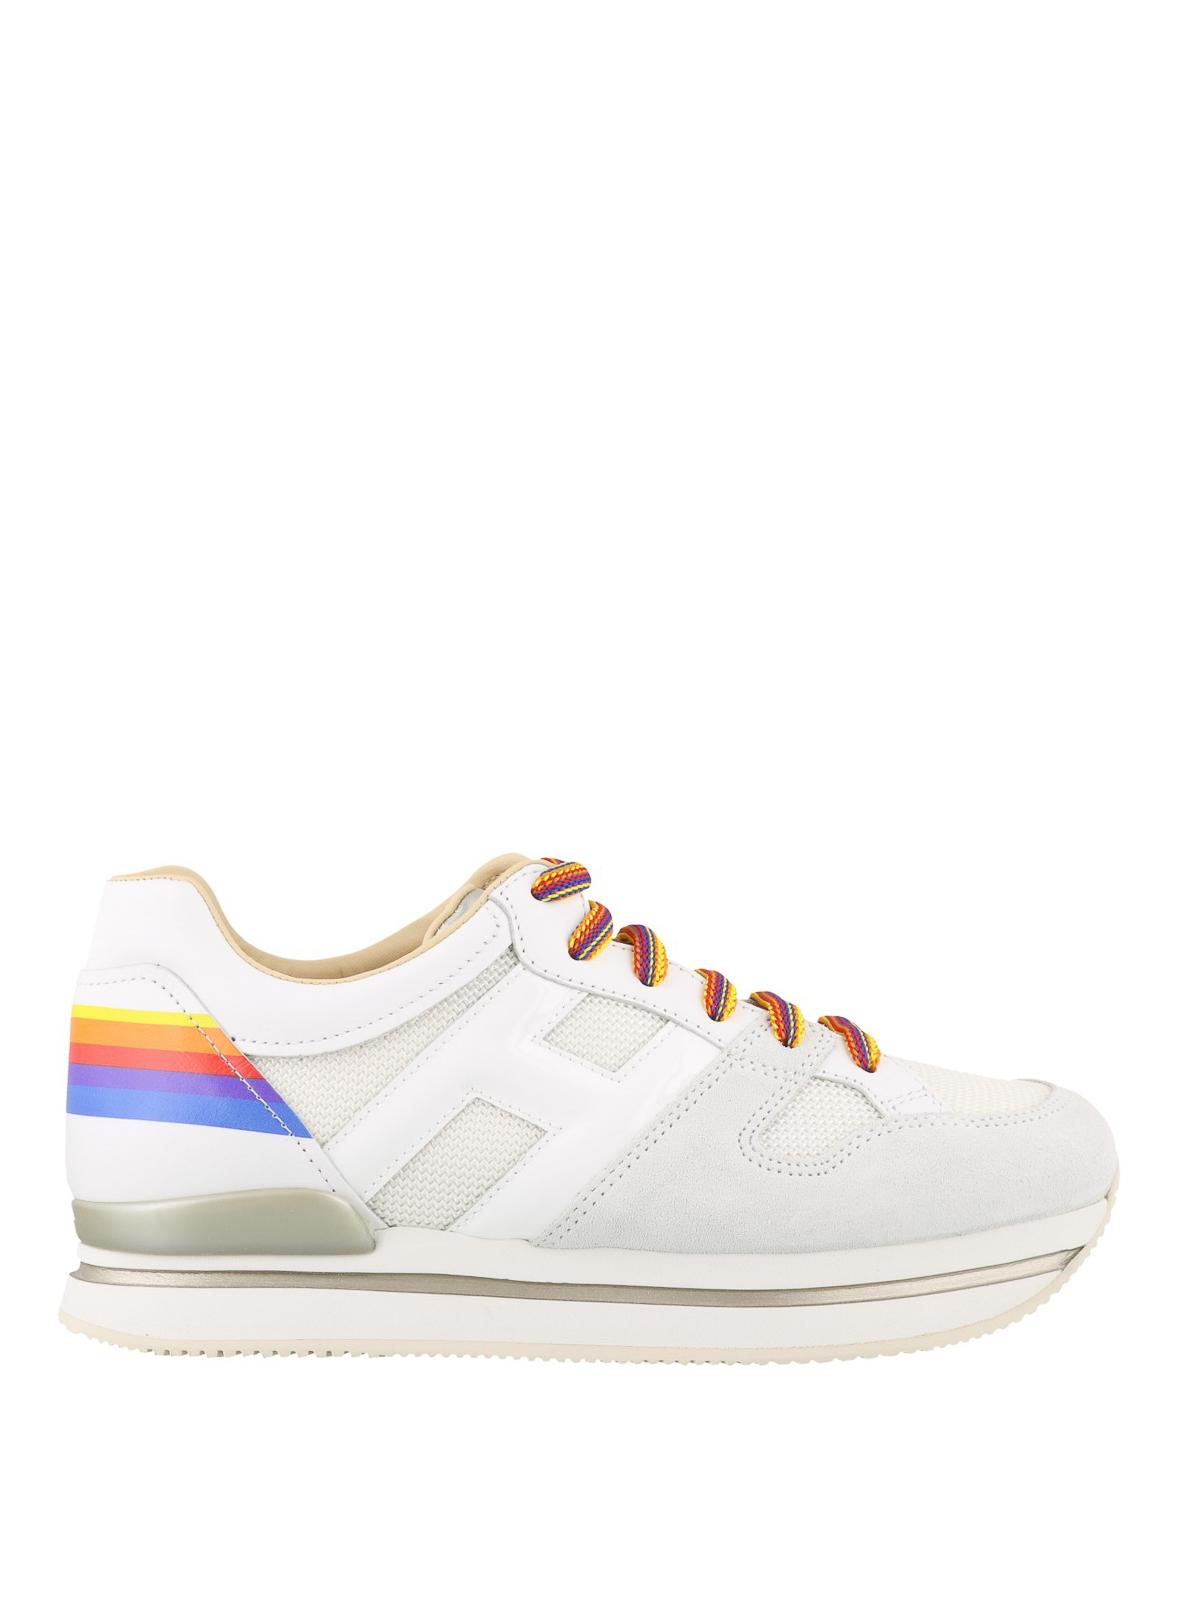 Sneakers Hogan - Sneaker arcobaleno in tessuto e pelle ...